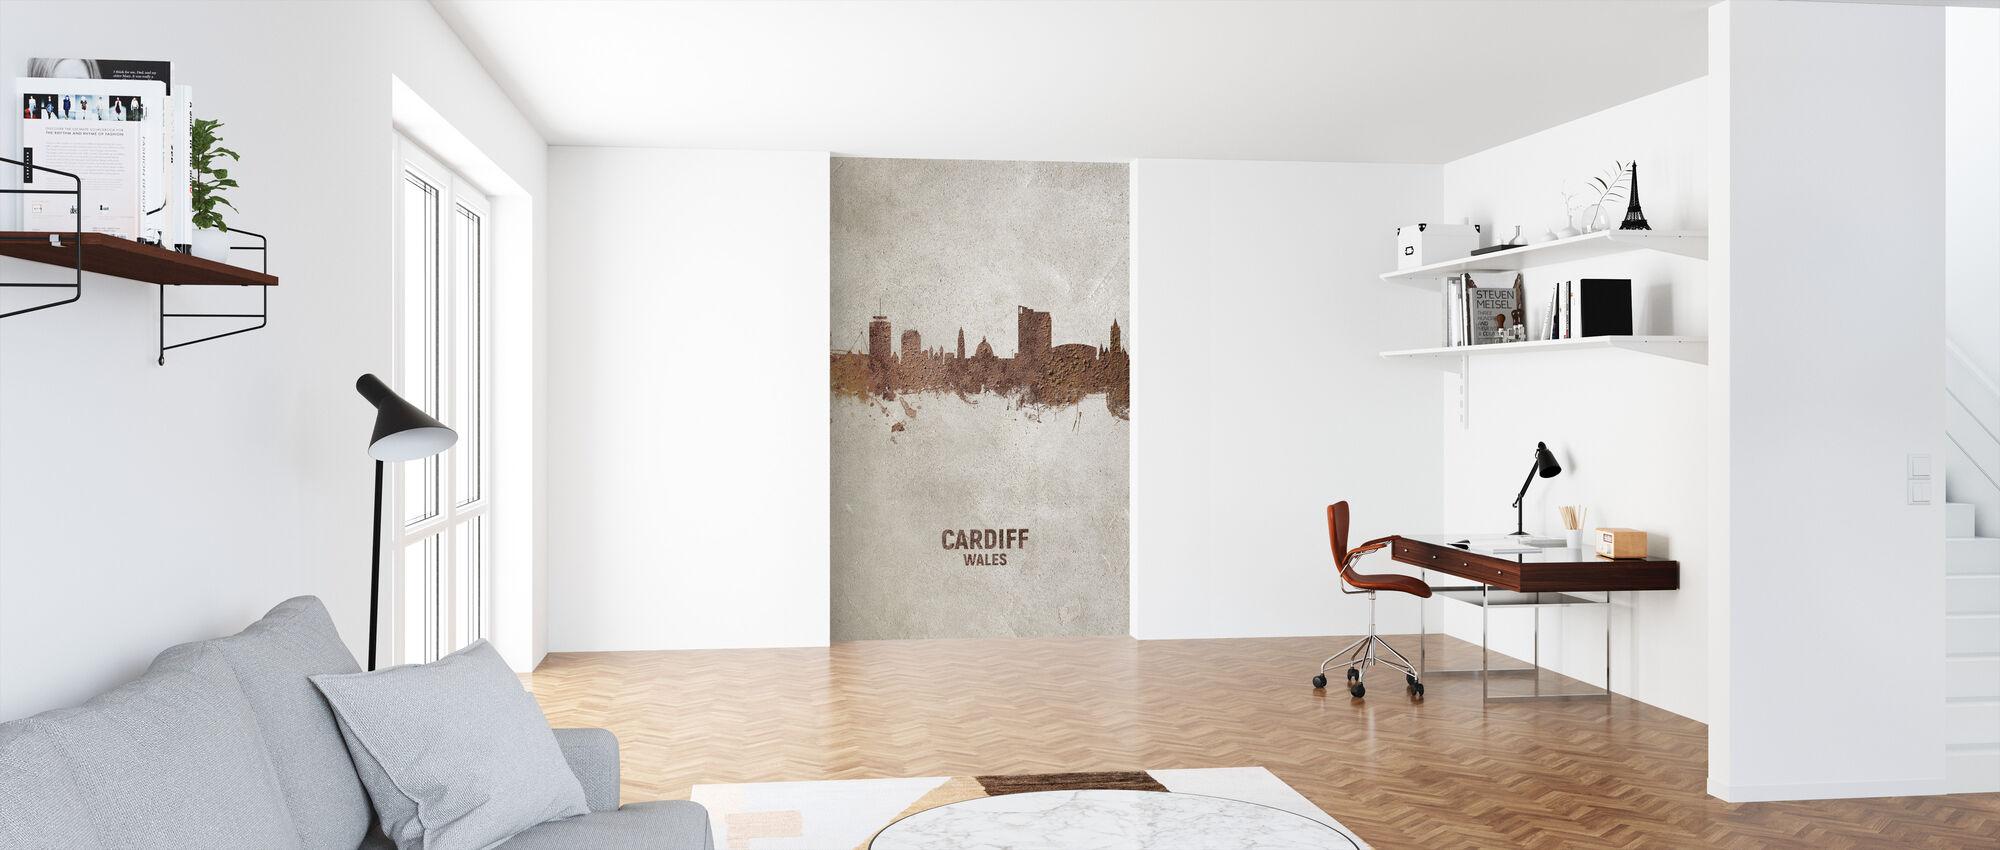 Cardiff Wales Skyline - Wallpaper - Office